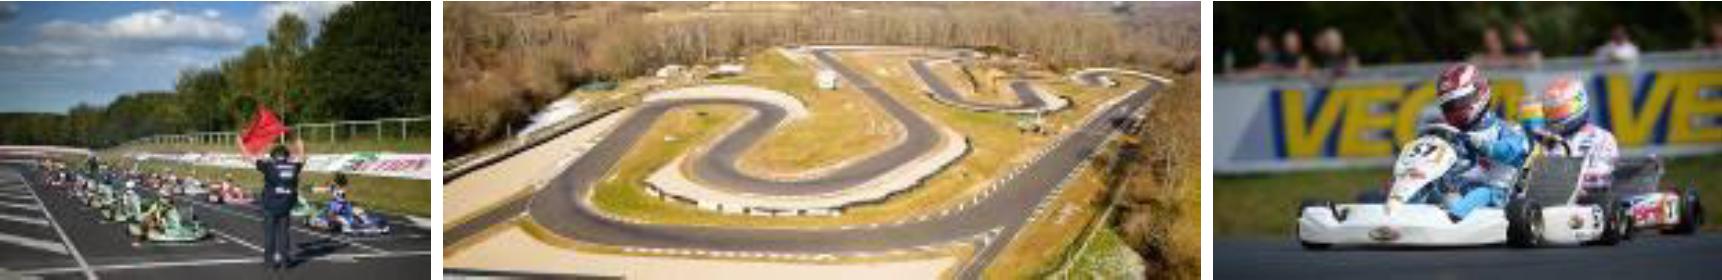 21 - Stage Karting